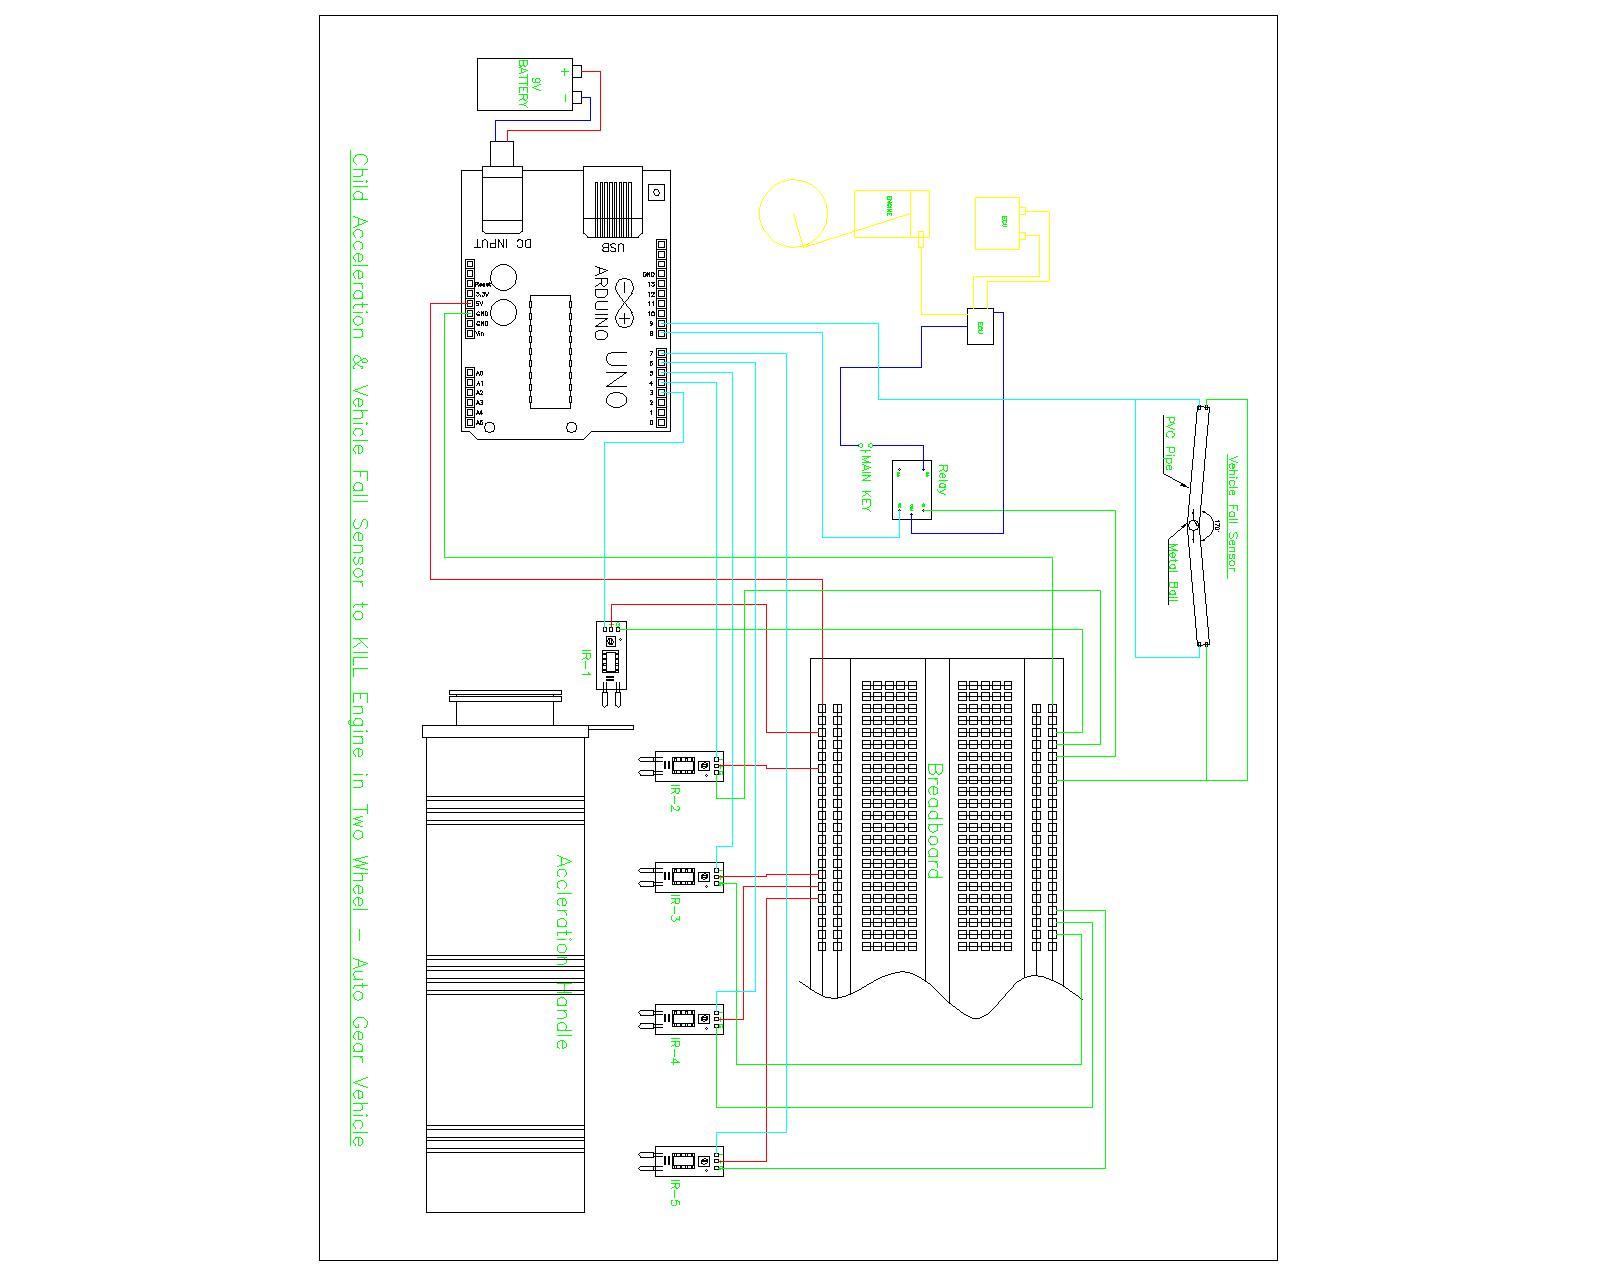 Arduino circuit t1ankkfxkx